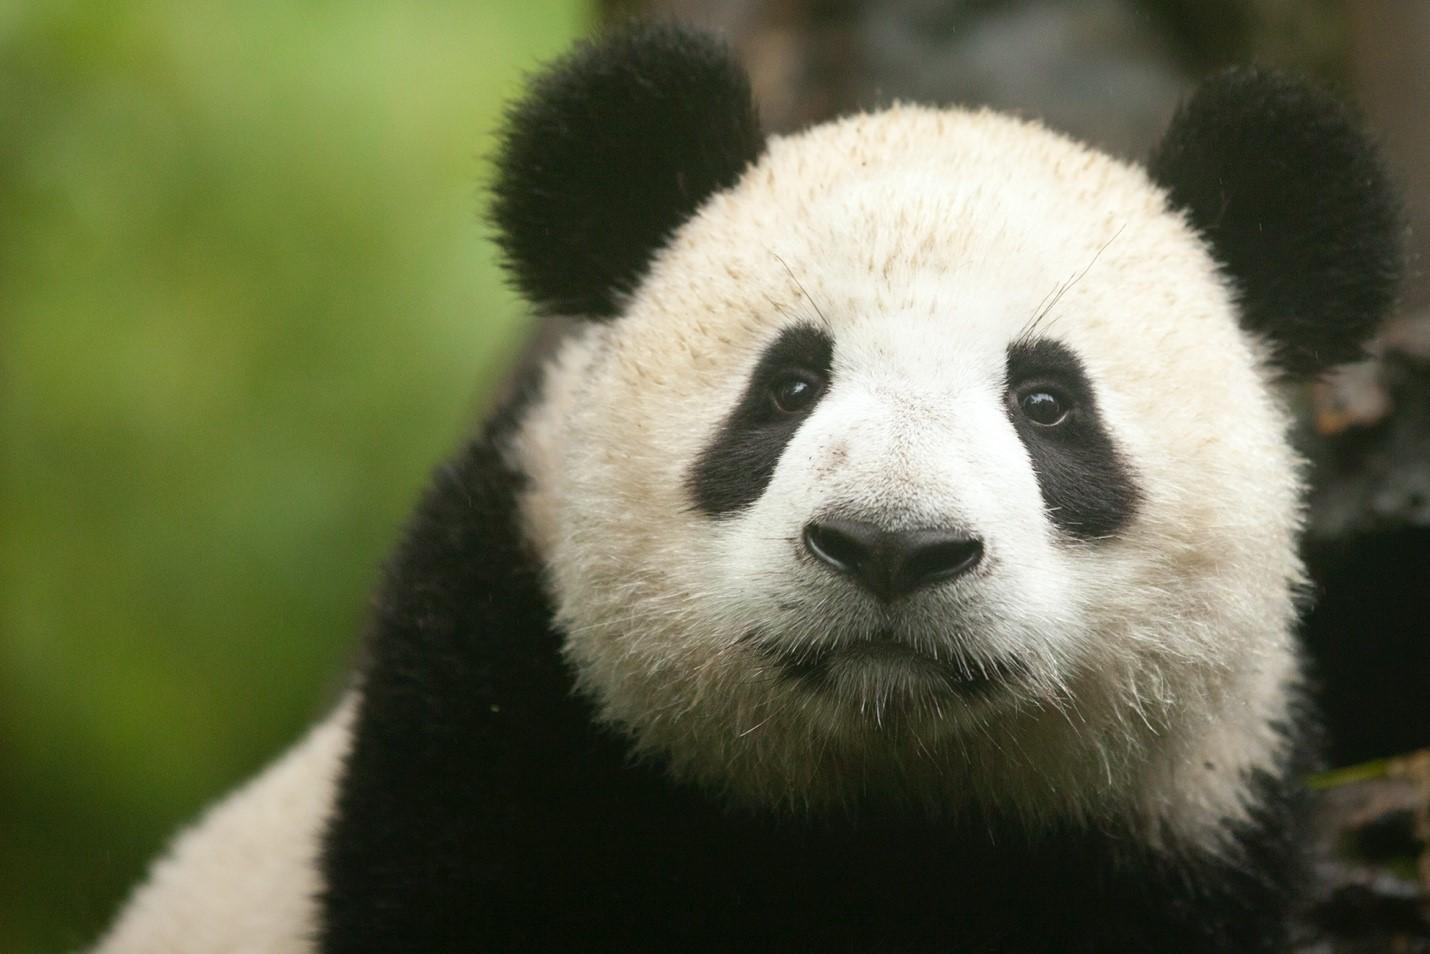 a panda's face fills the frame